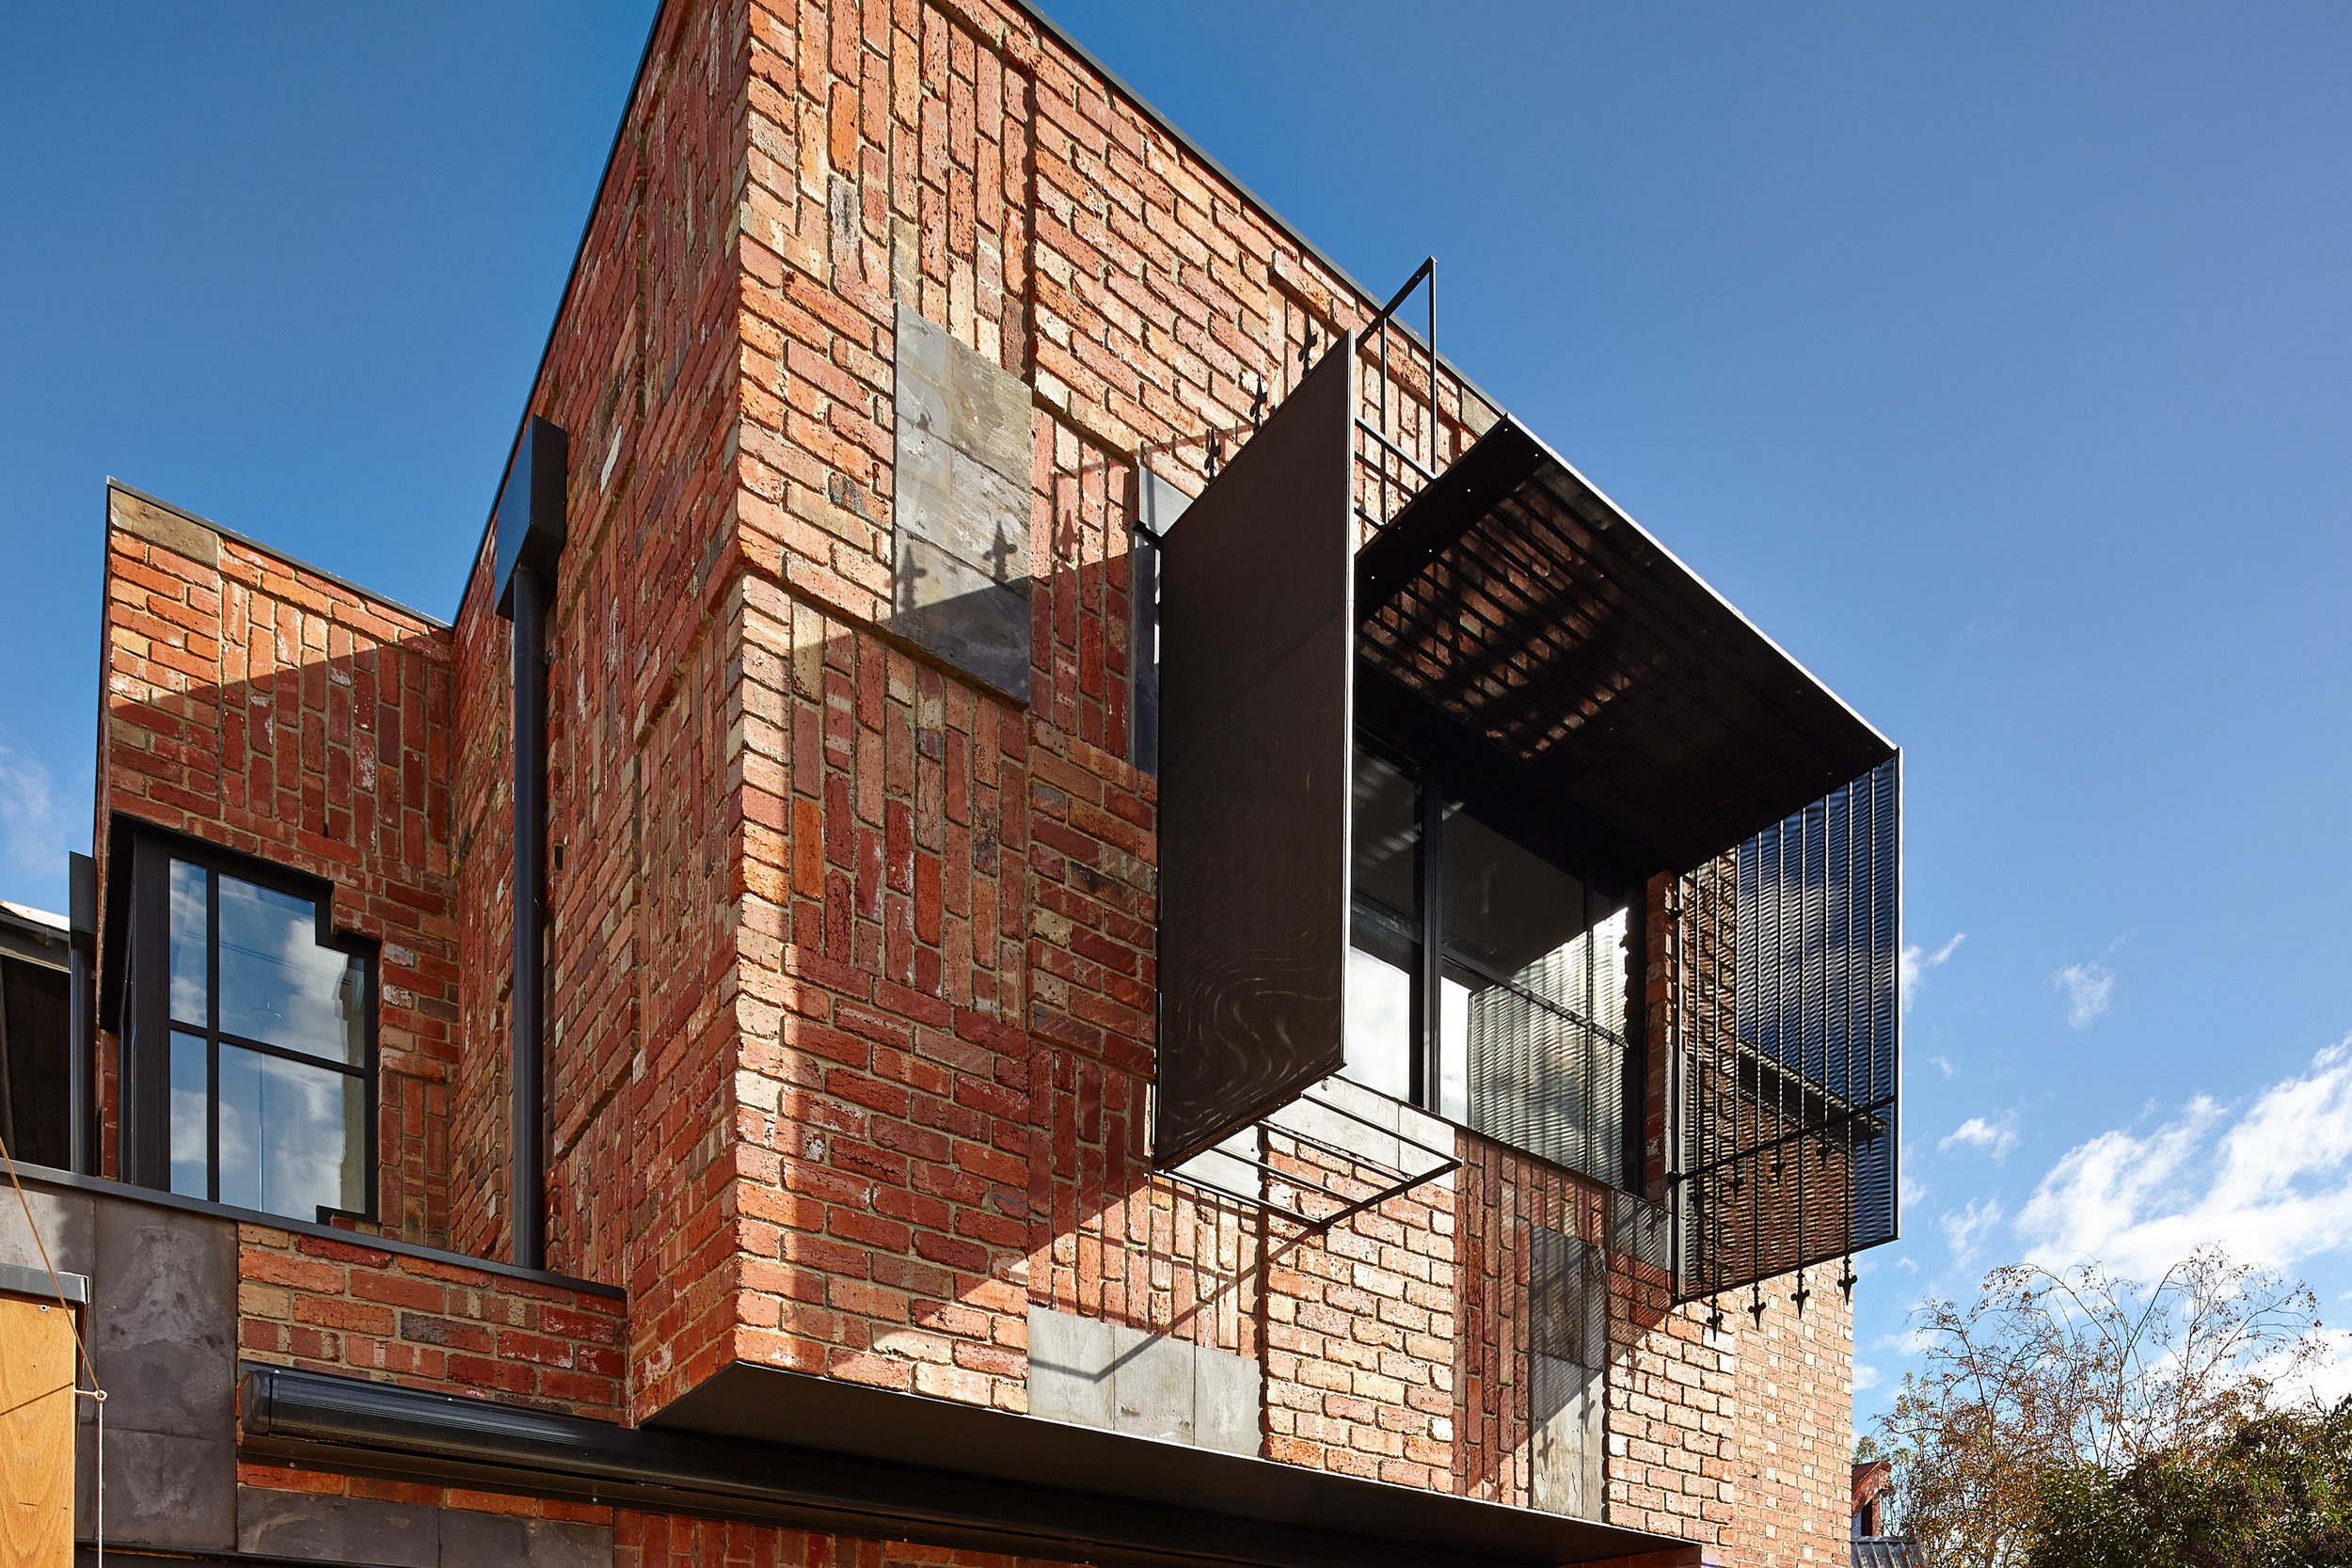 cubo-house-phooey-architects-the-design-emotive-08.jpg